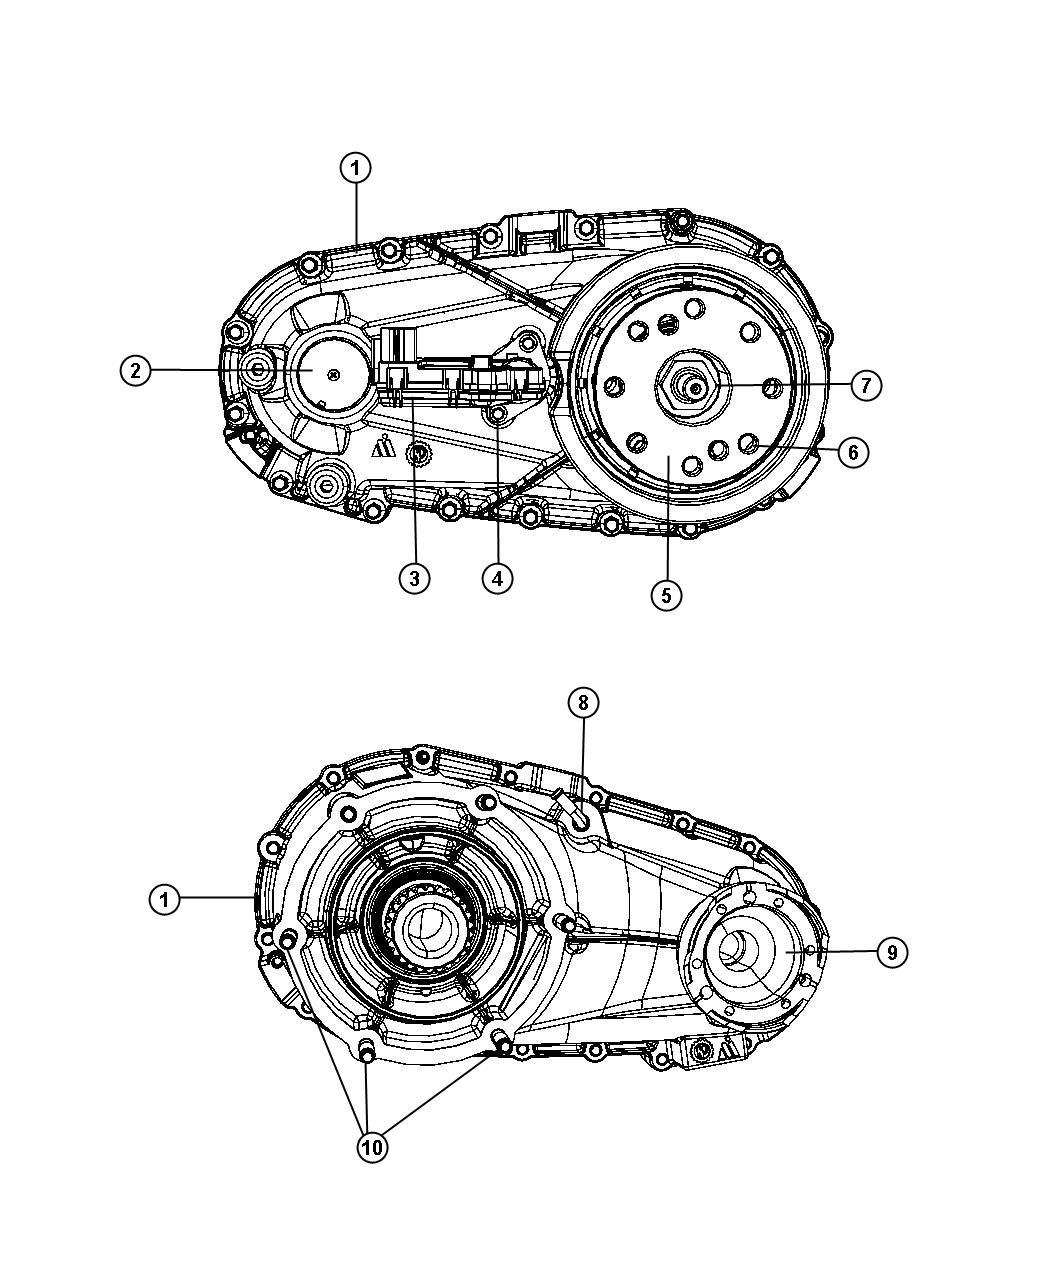 Dodge Nitro Sxt Transfer Case Assembly And